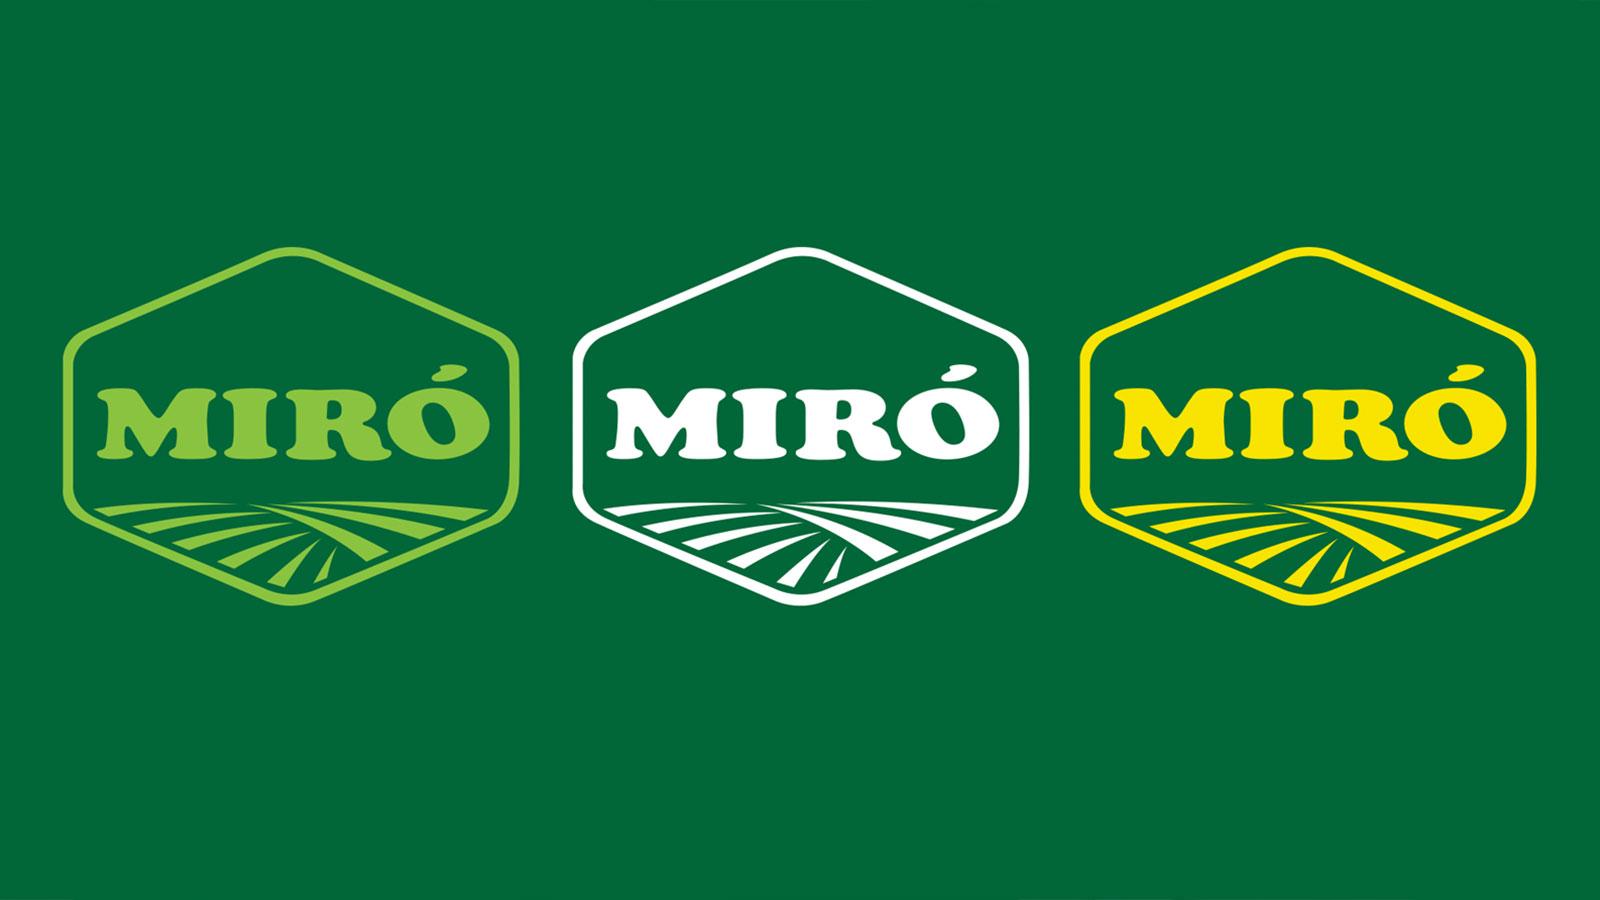 Arroz-Miro-N-03